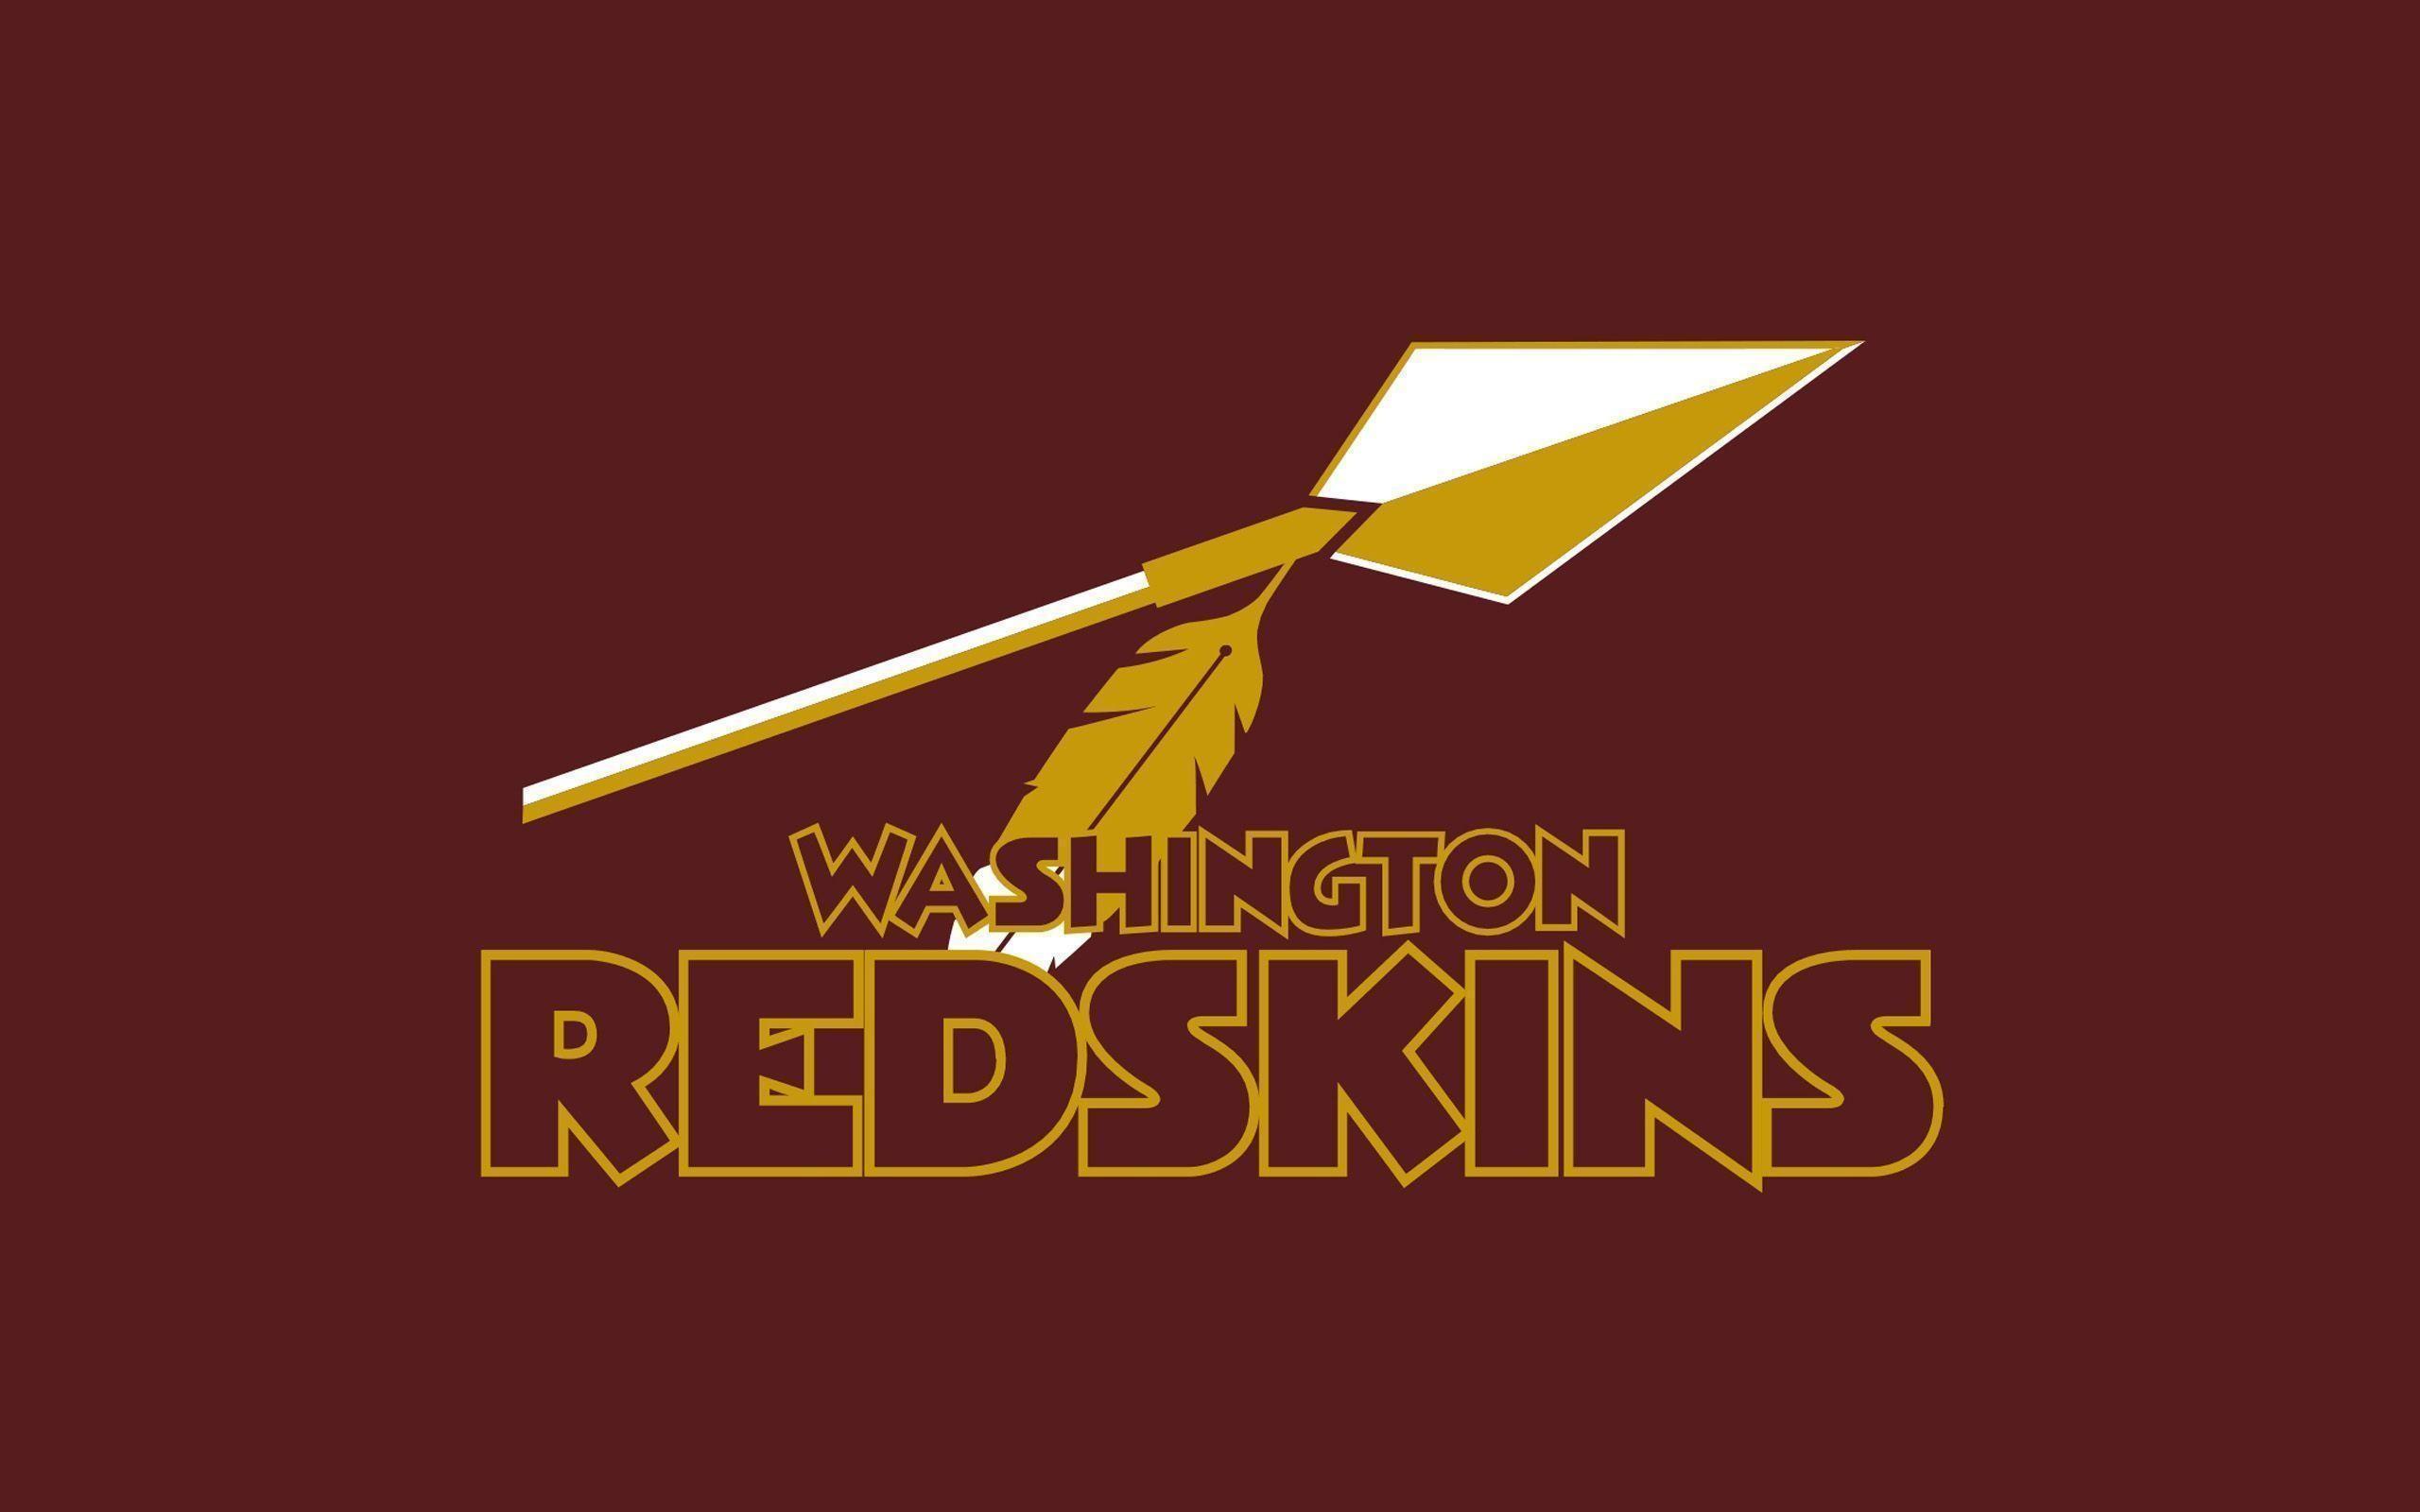 Redskins Picture Wallpaper HD   Wallmeta.